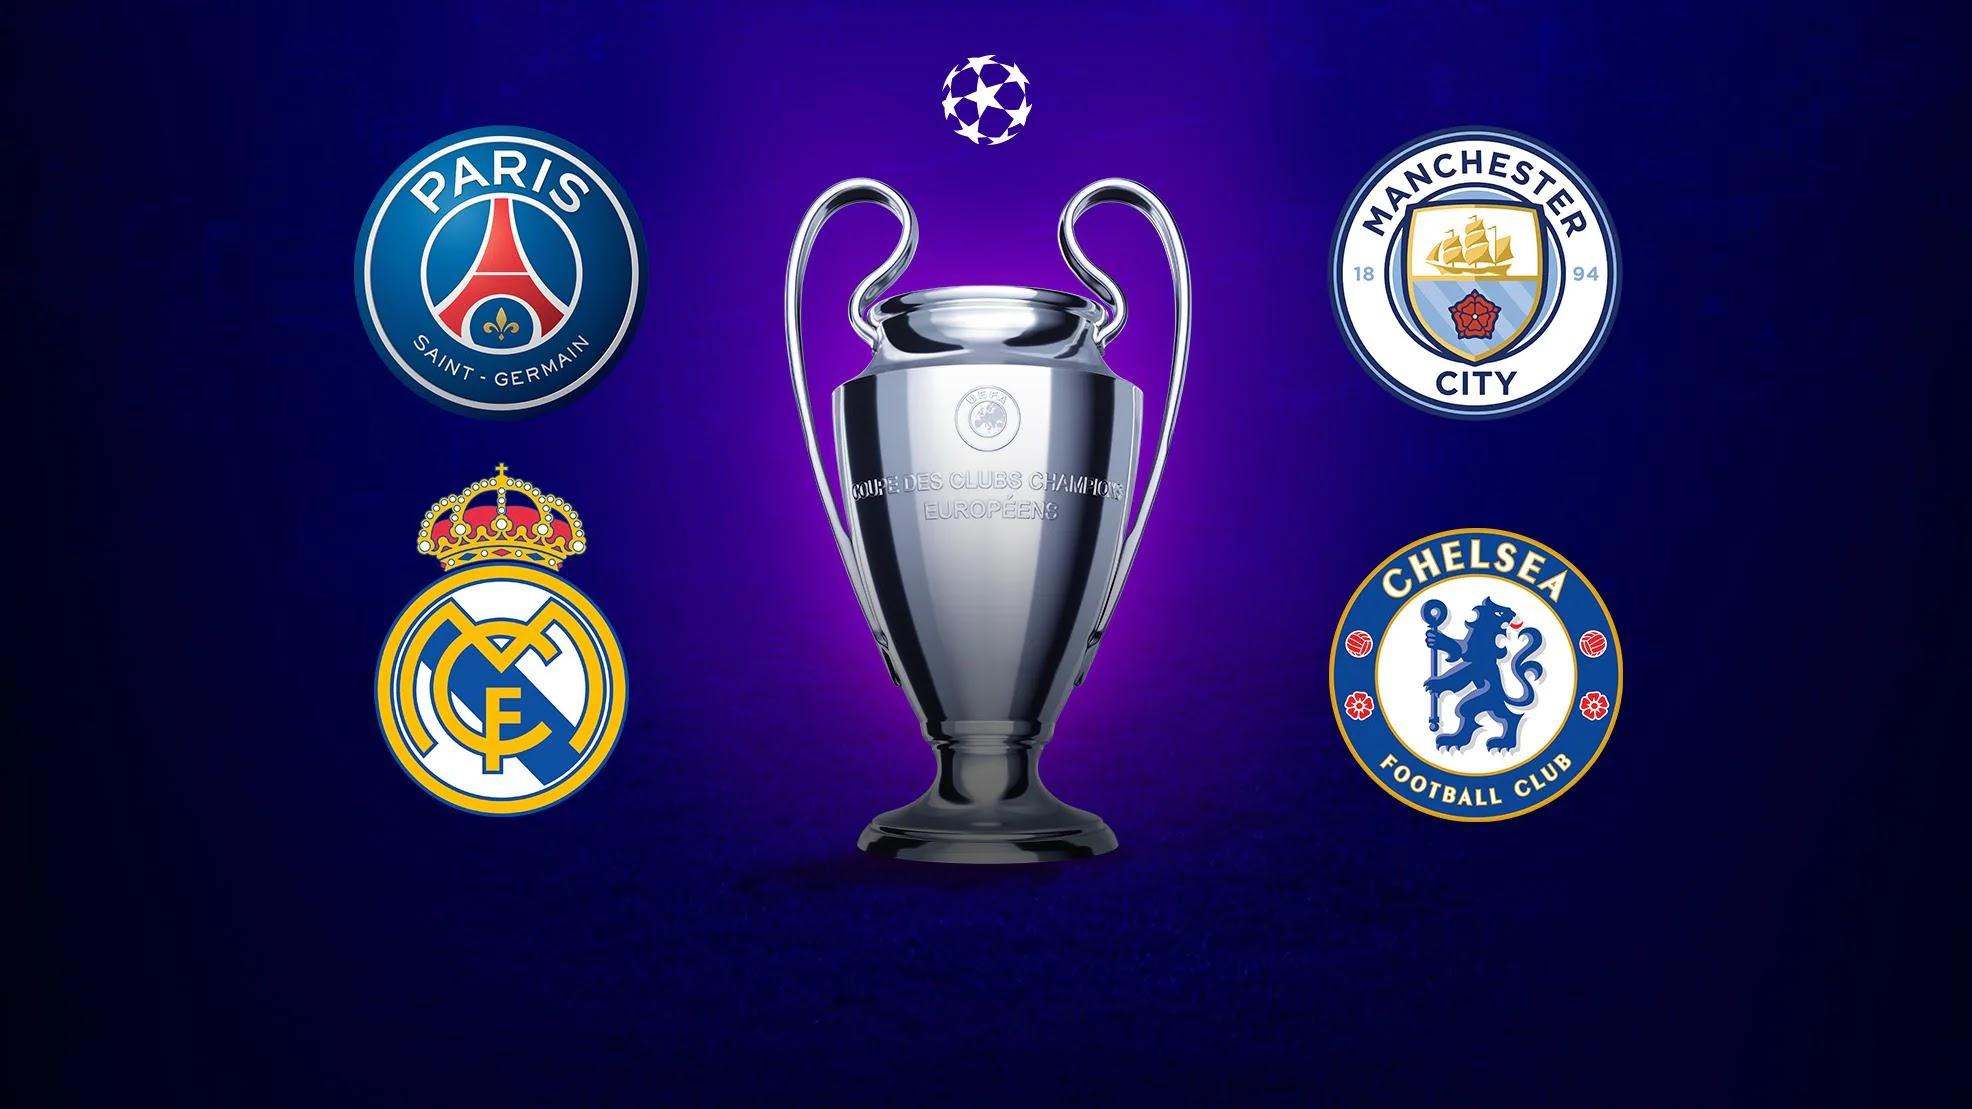 Champions League semi-final